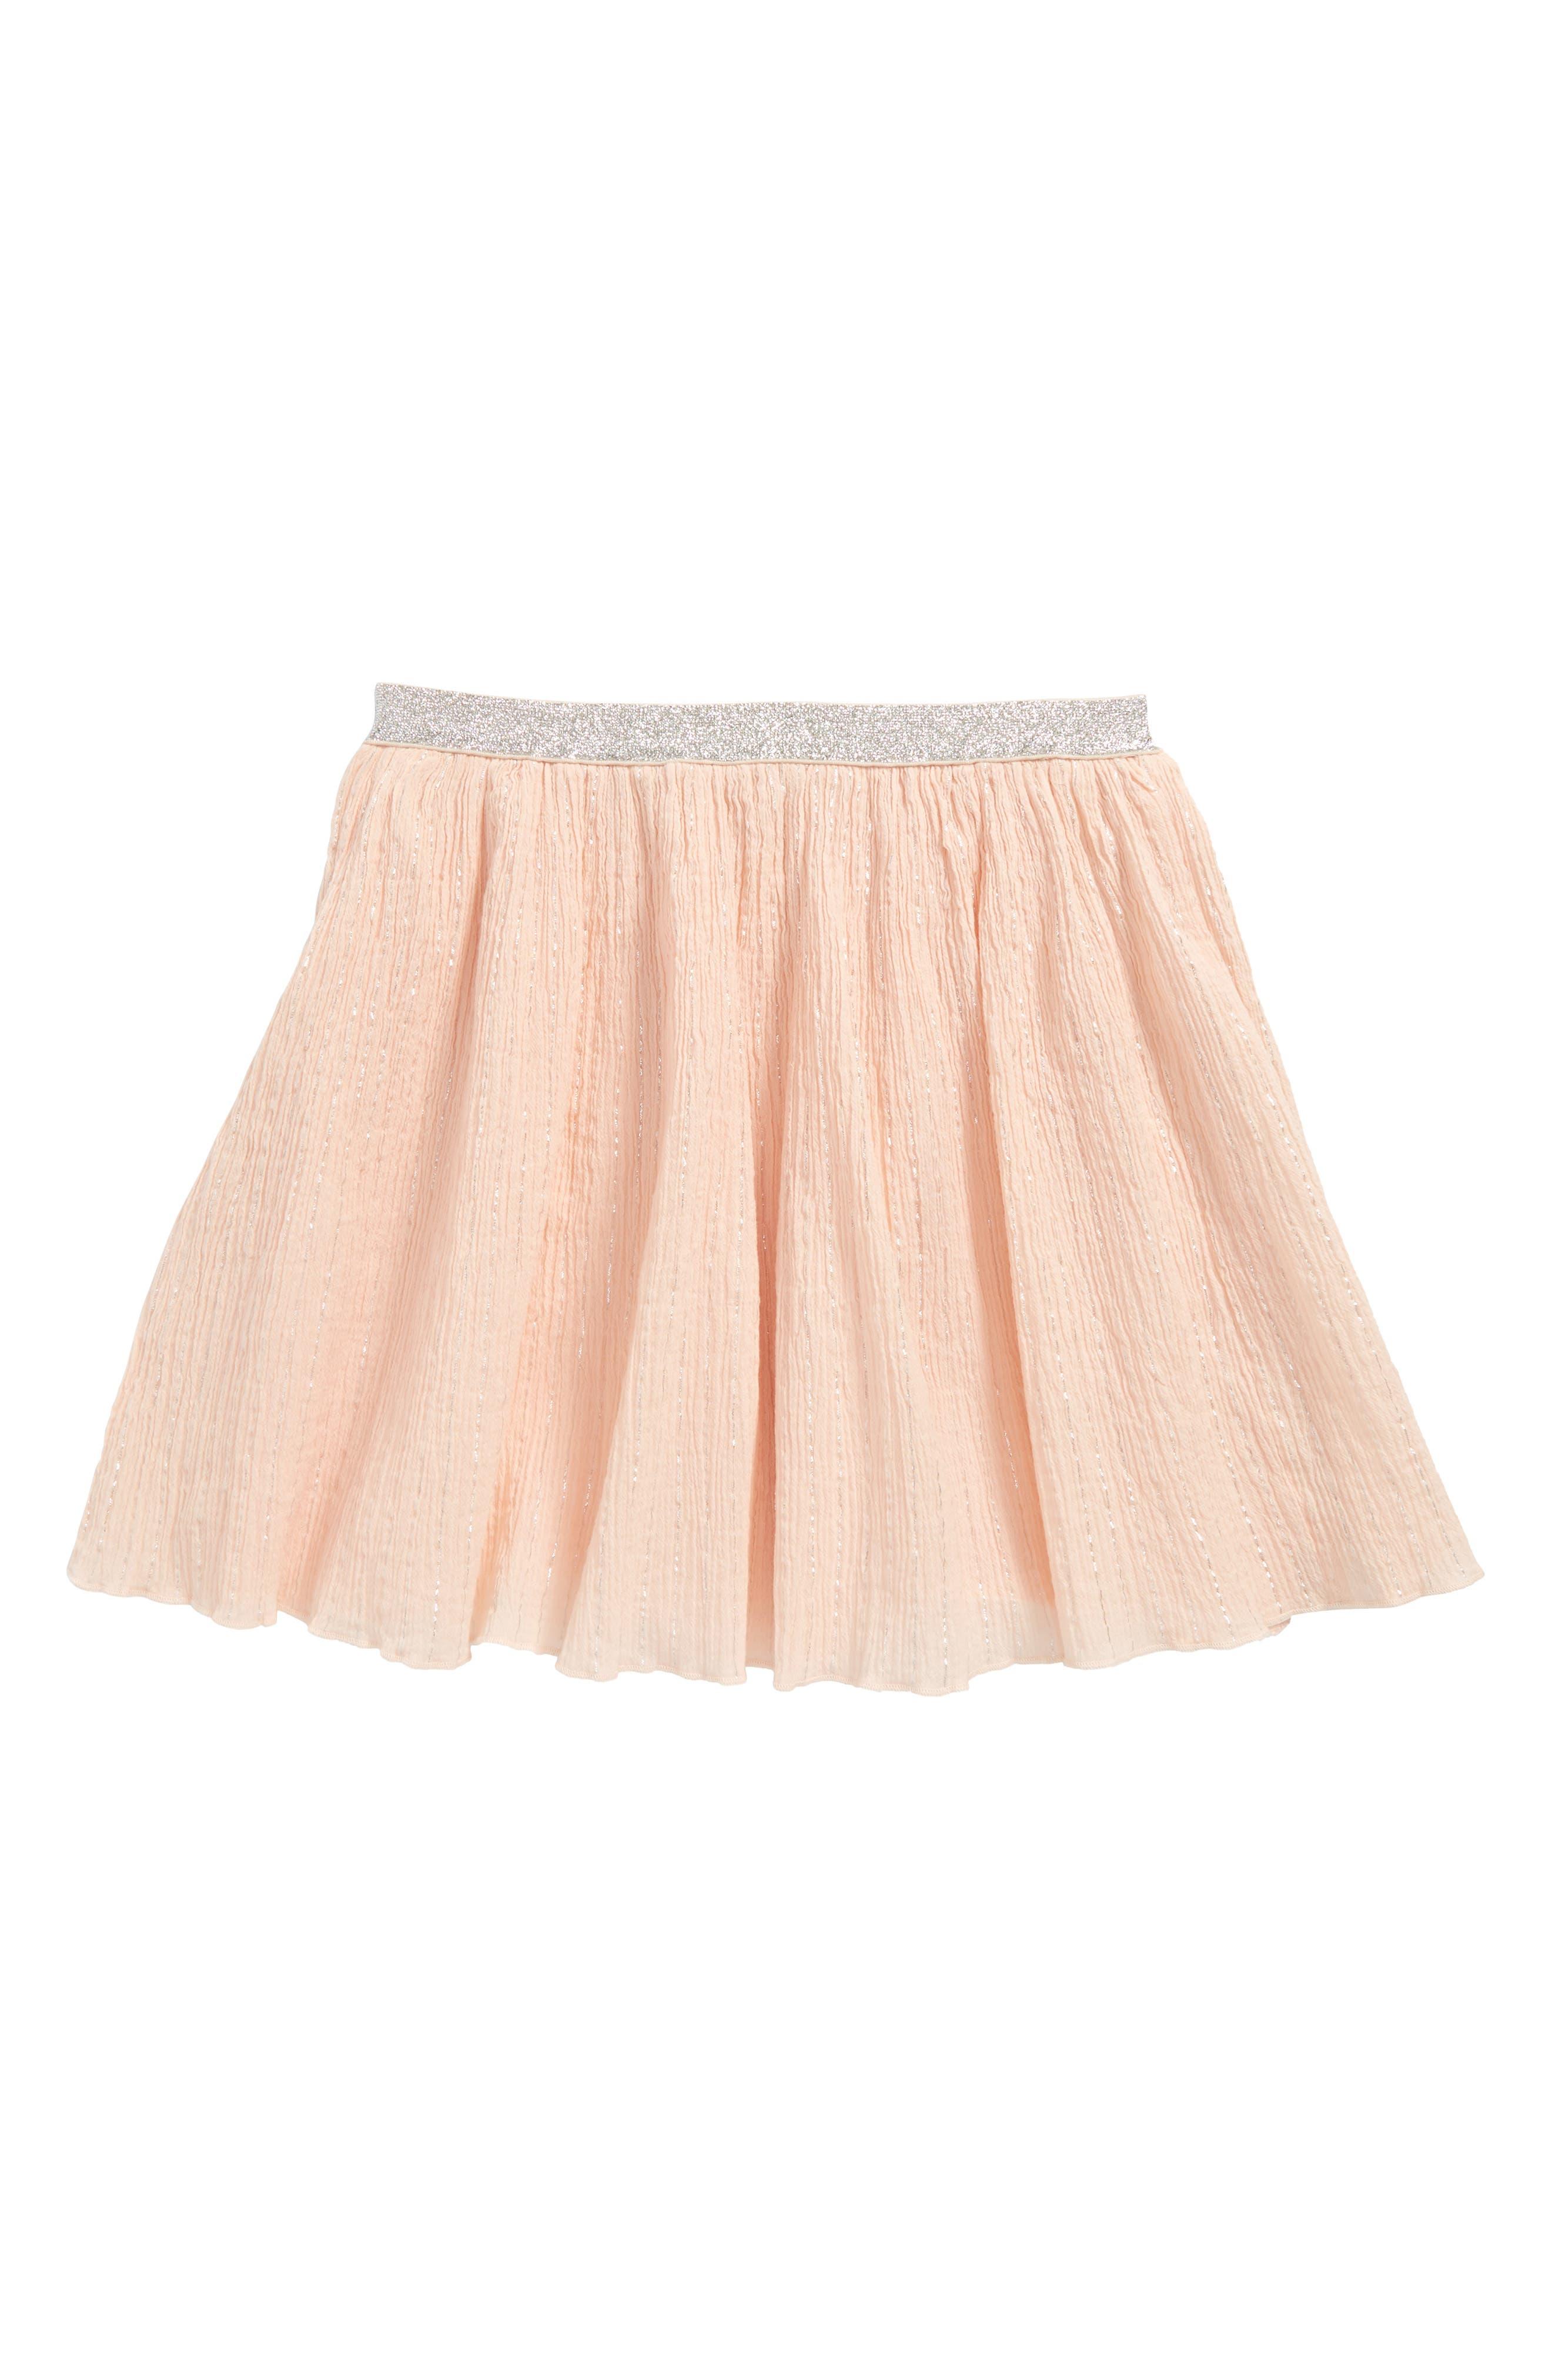 Peek Hailey Skirt,                             Main thumbnail 1, color,                             951